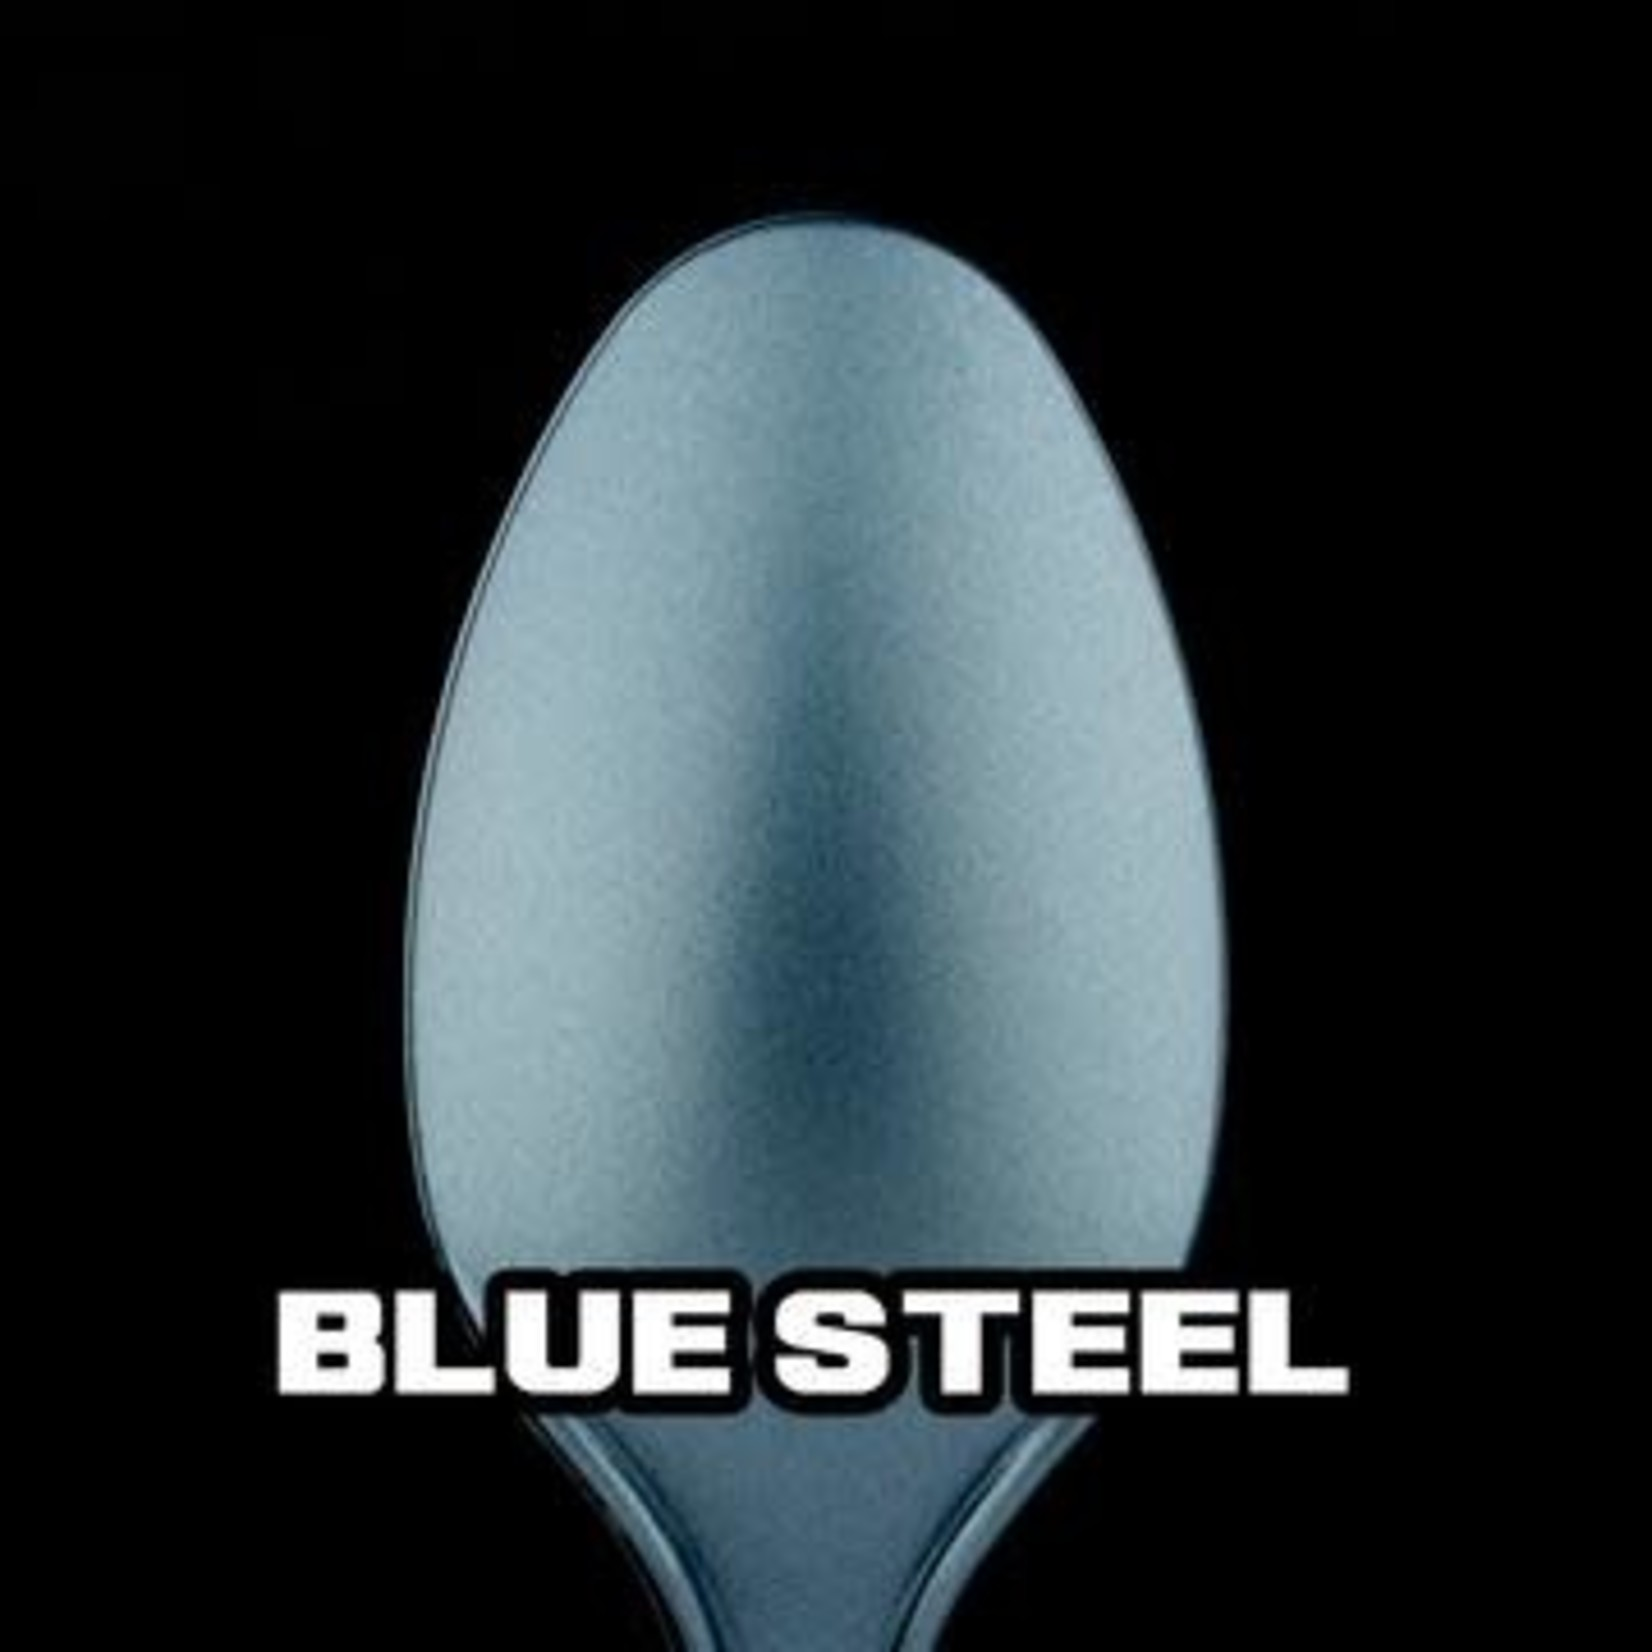 Turbo Dork Turbo Dork Blue Steel Metallic Acrylic Paint 20ml Bottle